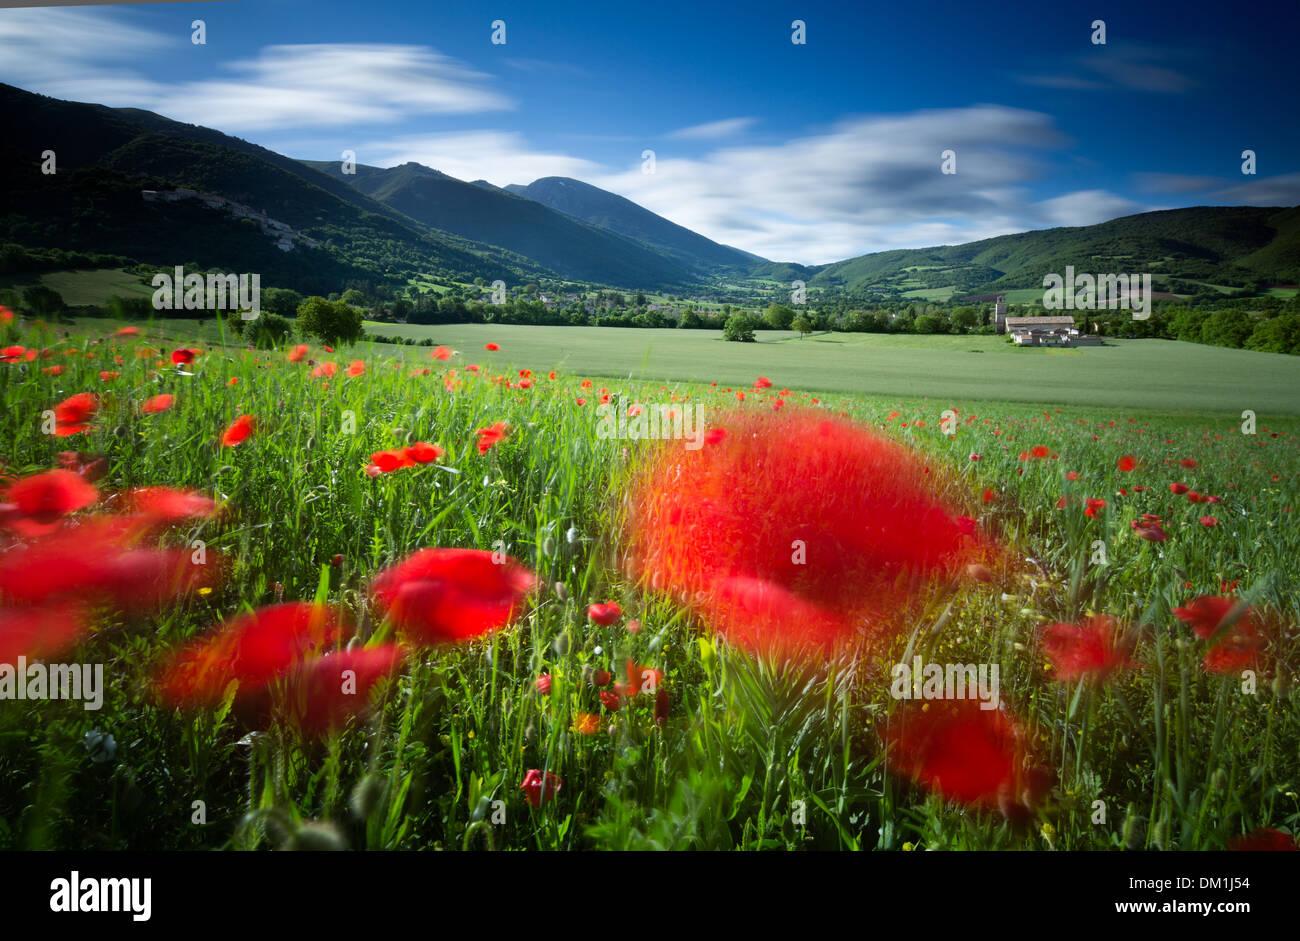 field nr Campi, Umbria, Italy - Stock Image